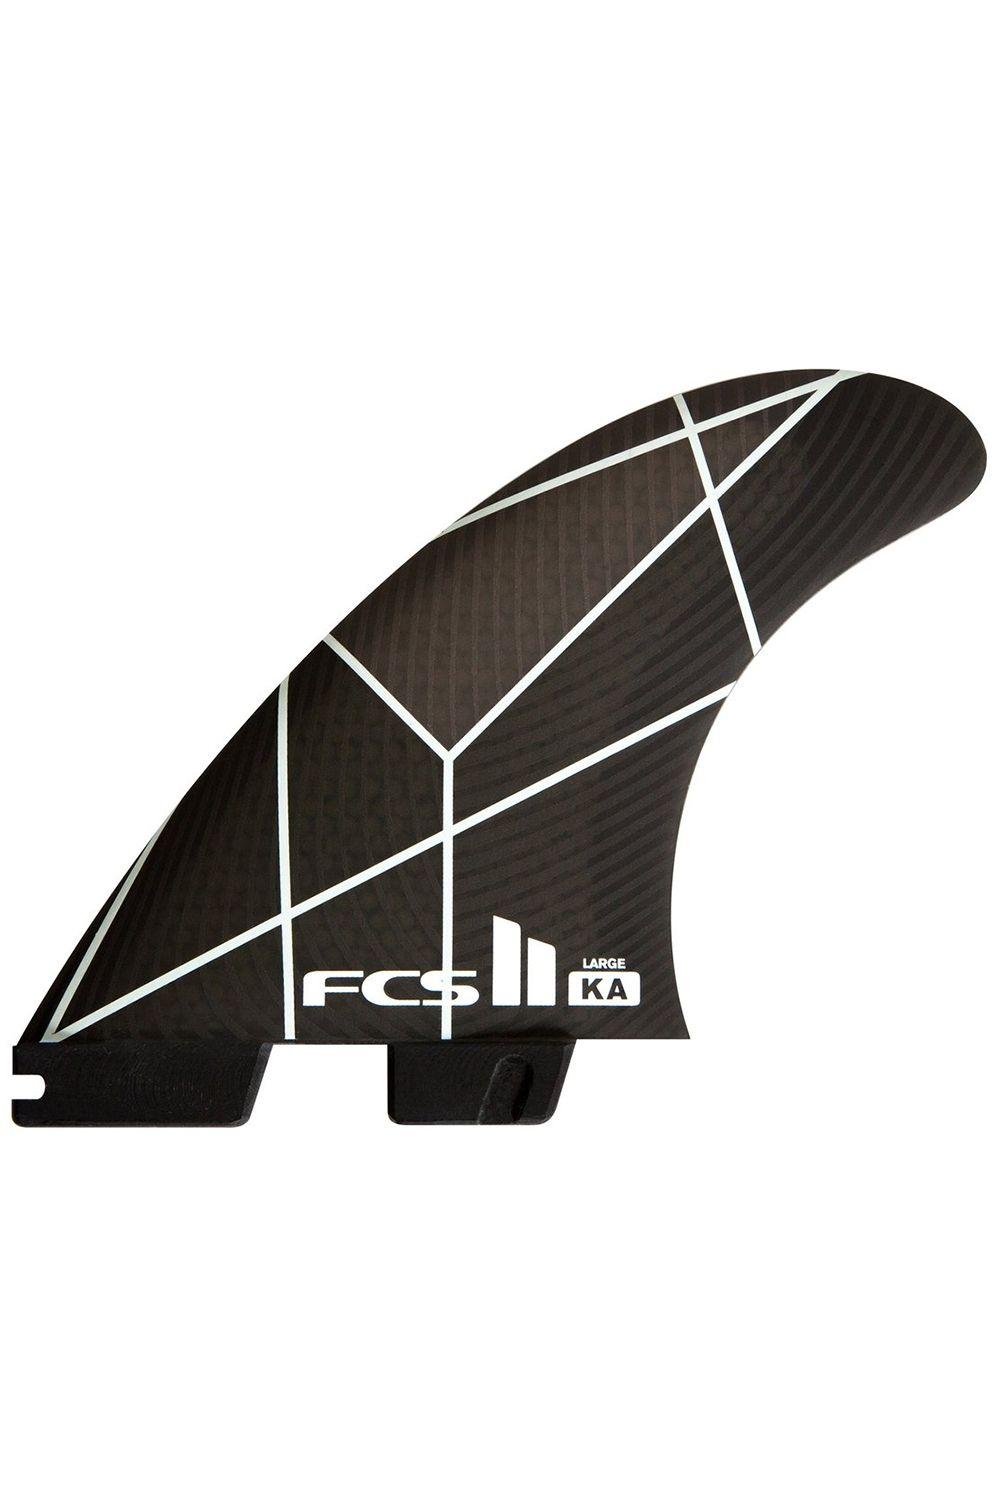 Fcs Fins II KA PC SMALL WHITE/GREY TRI Tri FCS II S